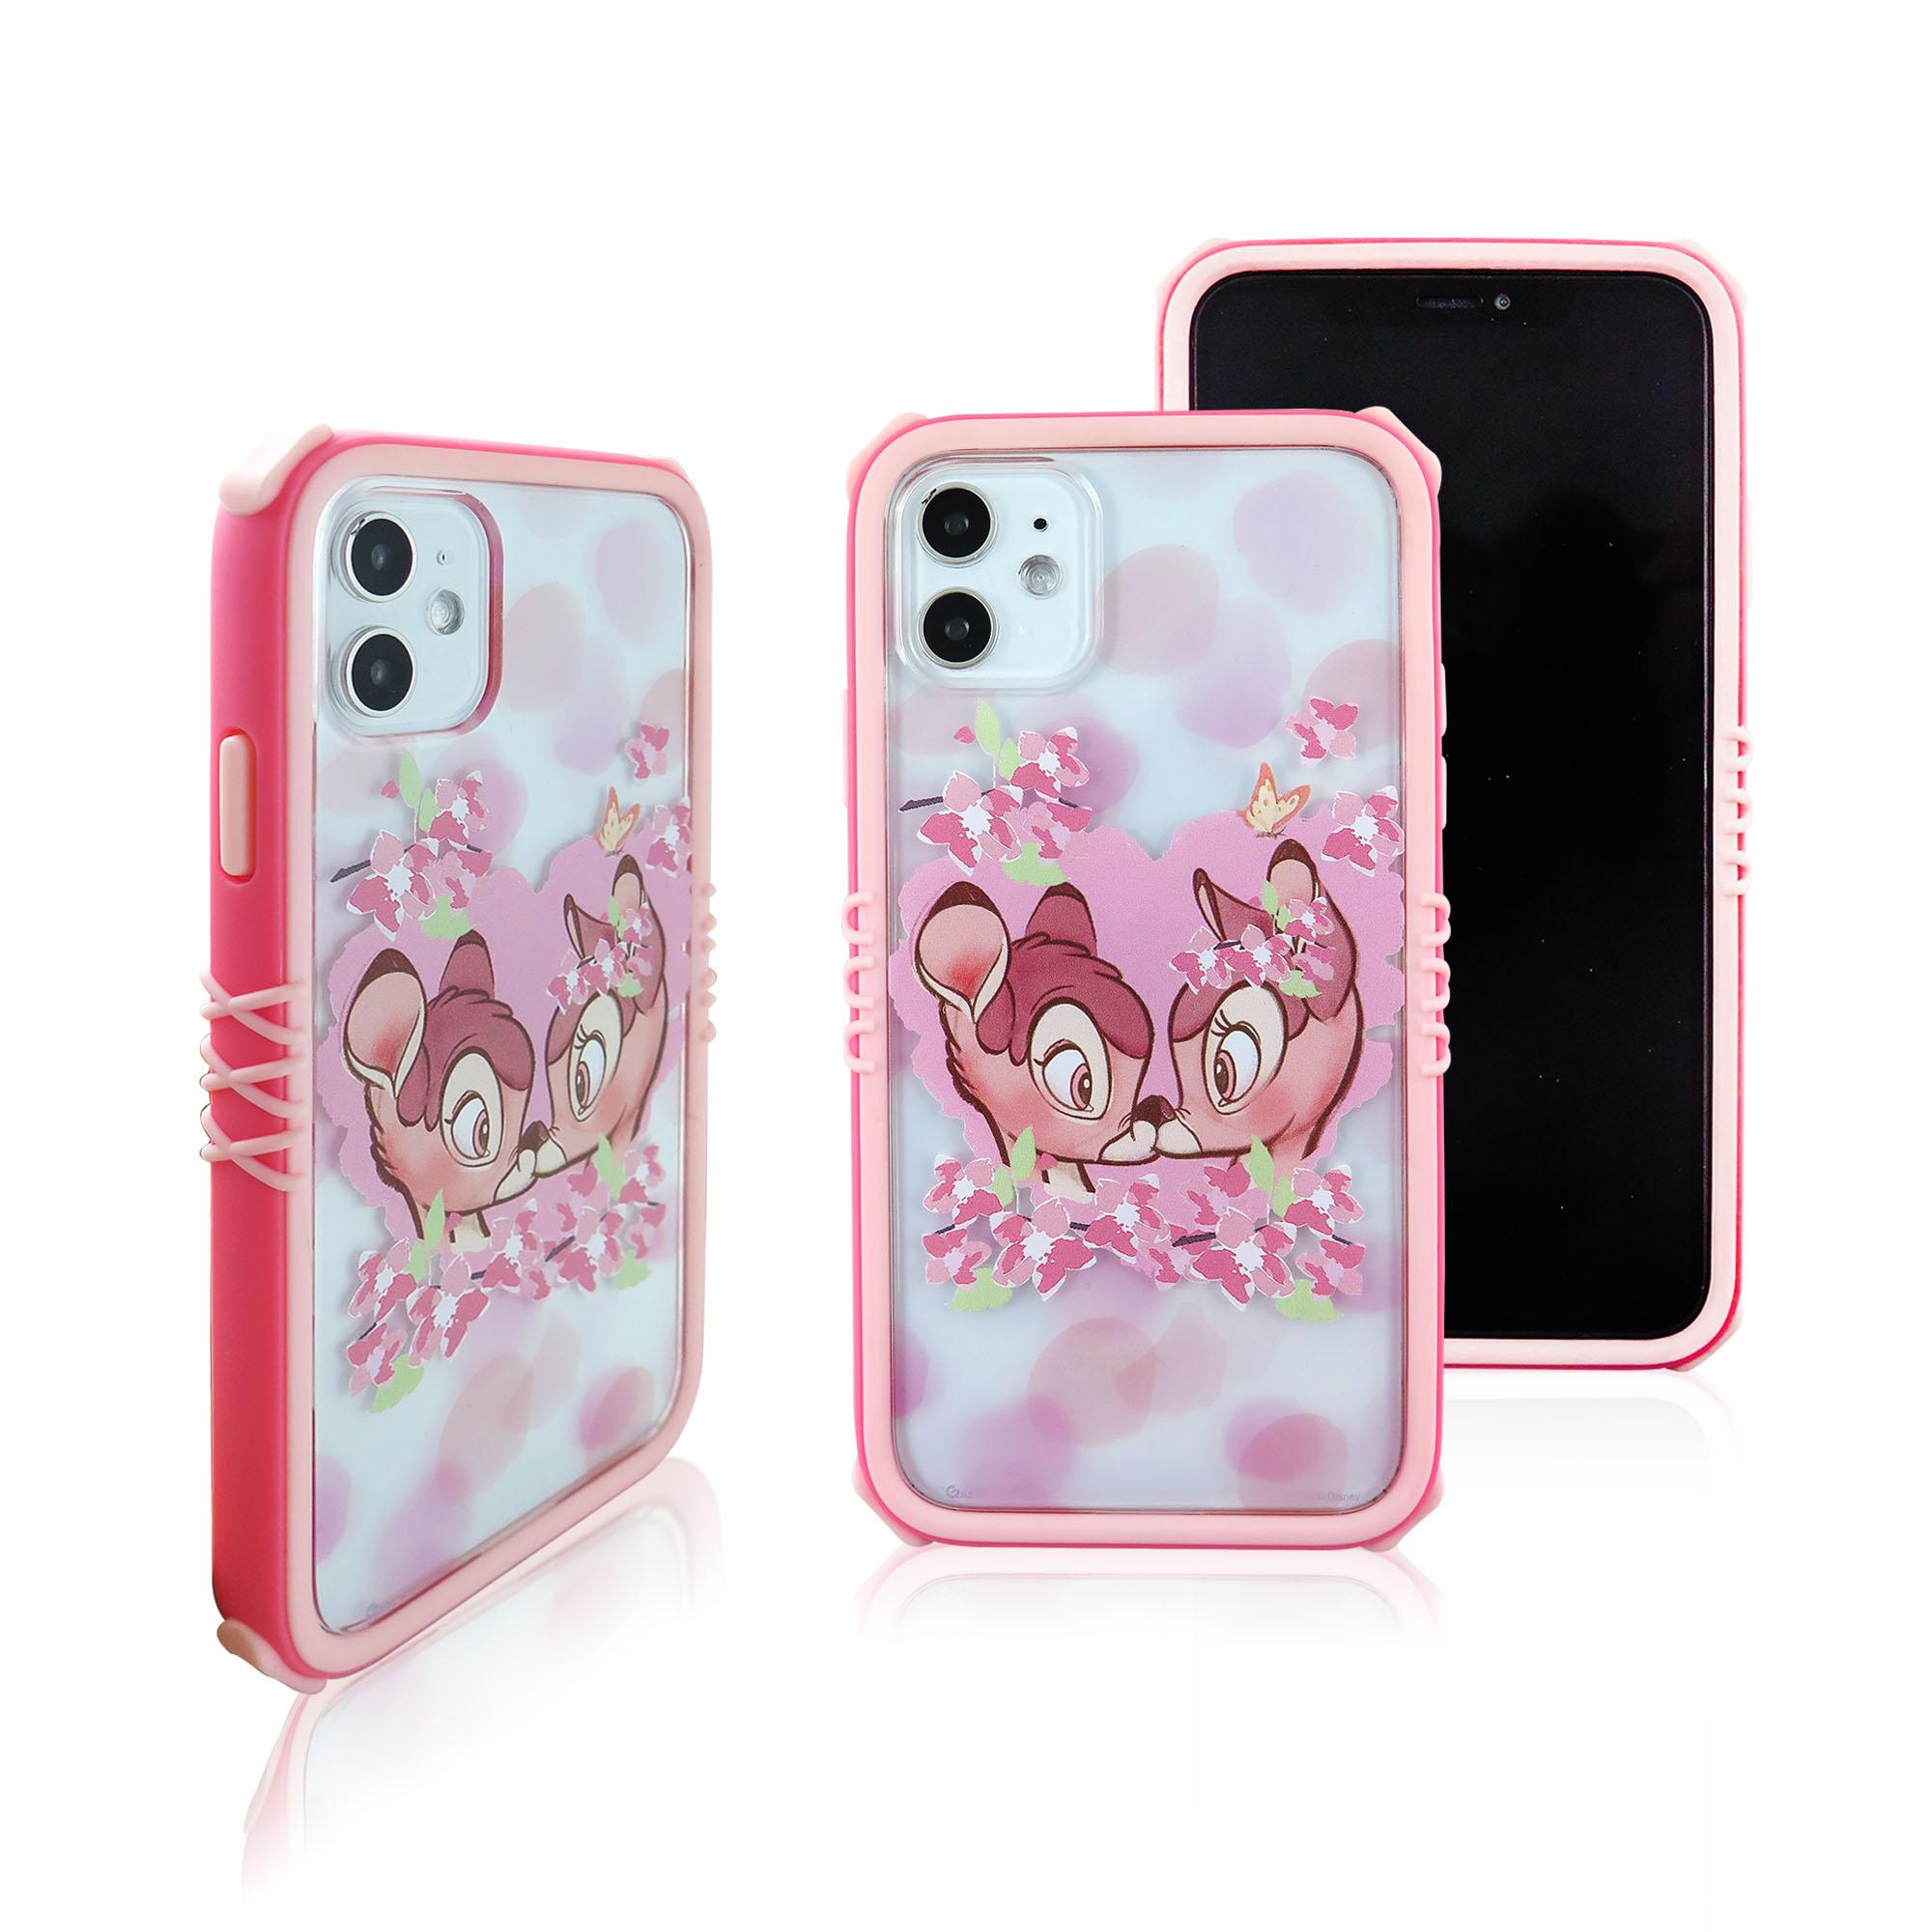 Disney迪士尼iPhone11櫻花系列雅典娜防摔殼_櫻花小鹿斑比